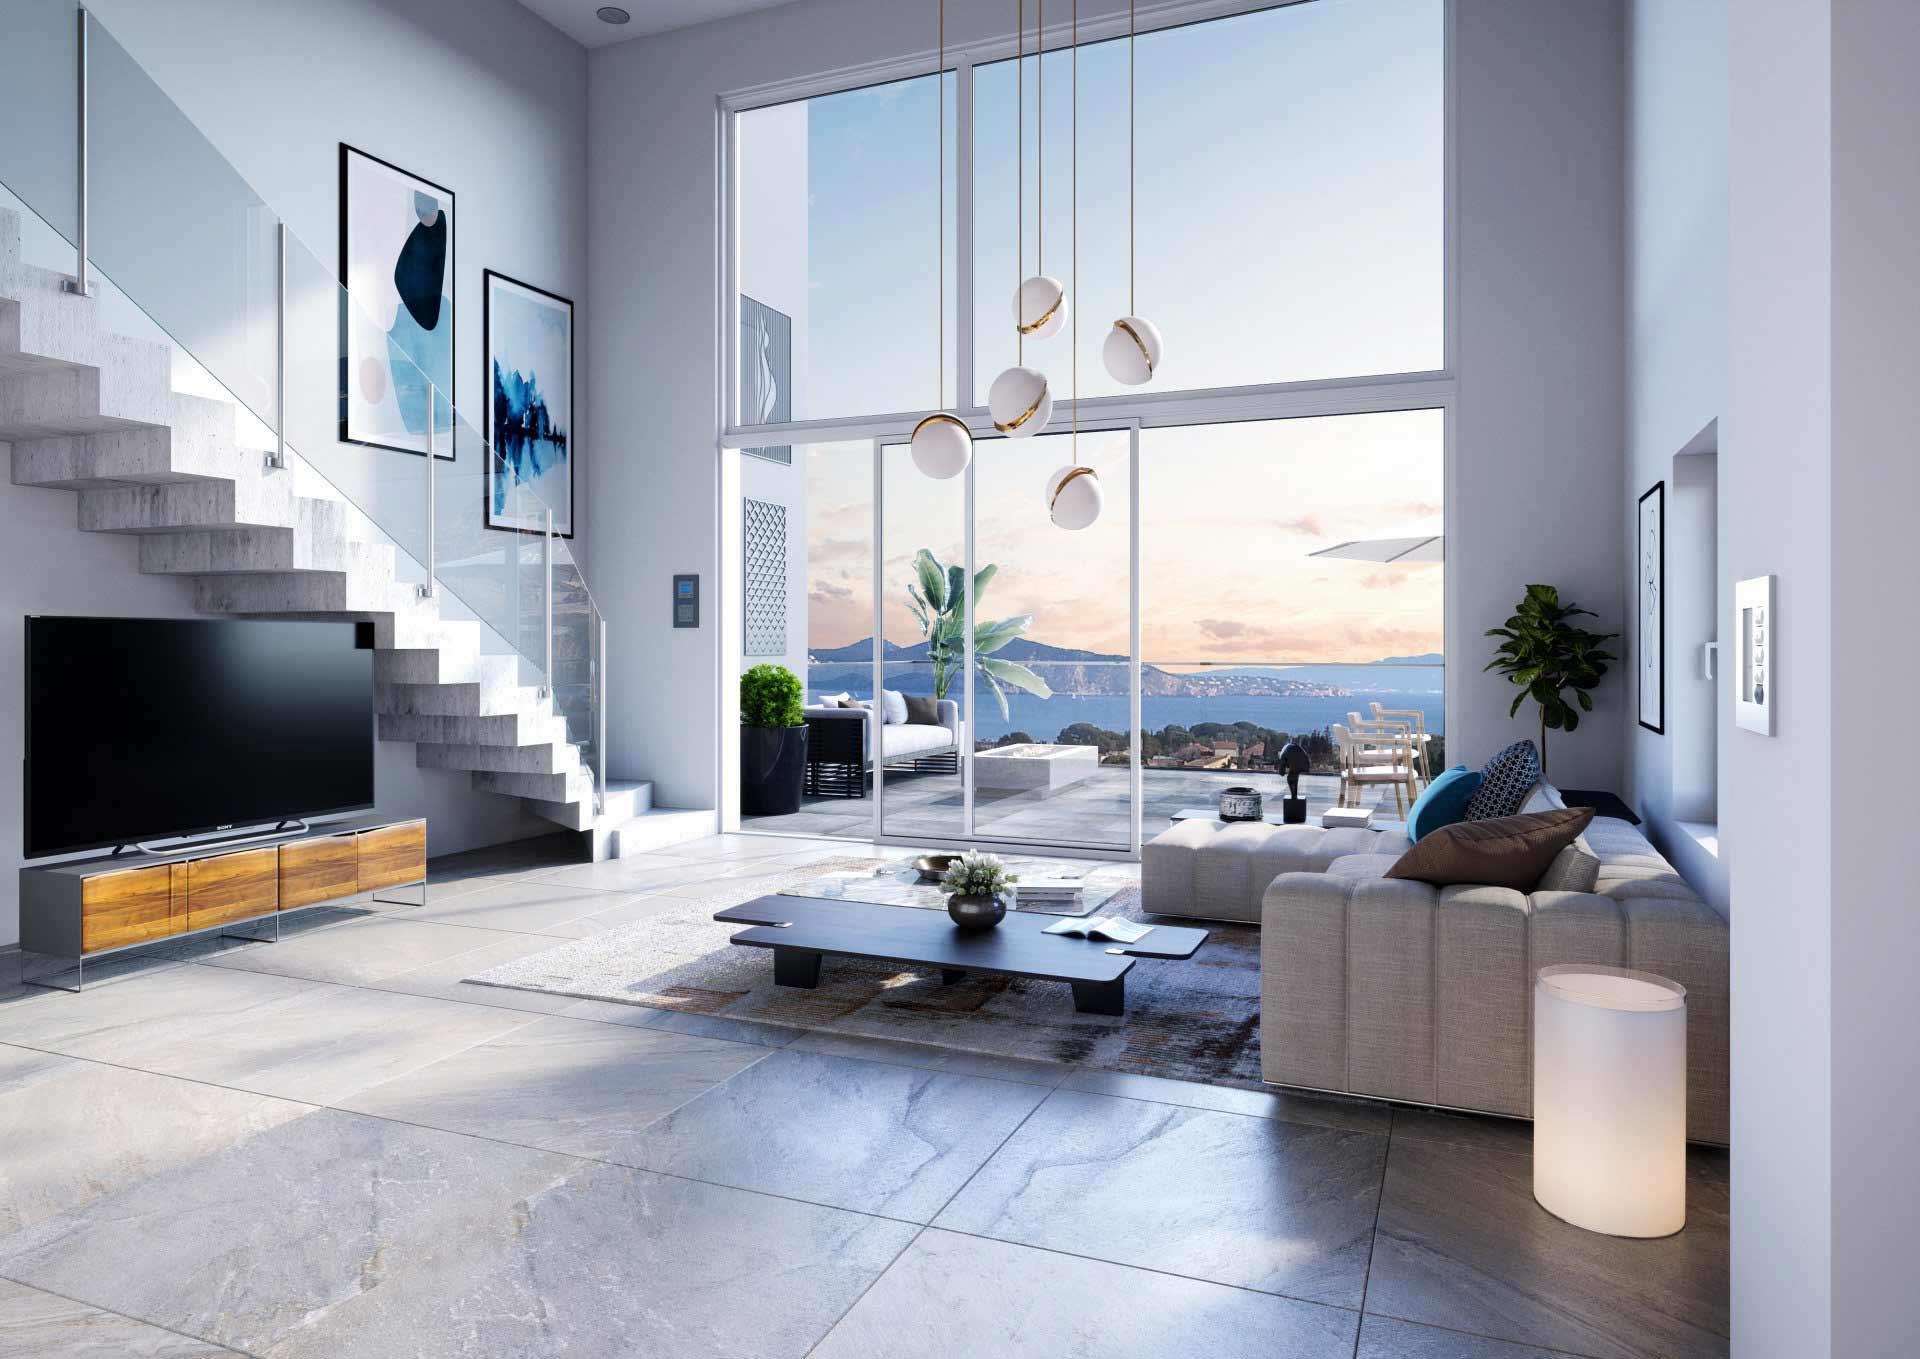 La Ciotat - France - Apartment , 5 rooms - Slideshow Picture 2